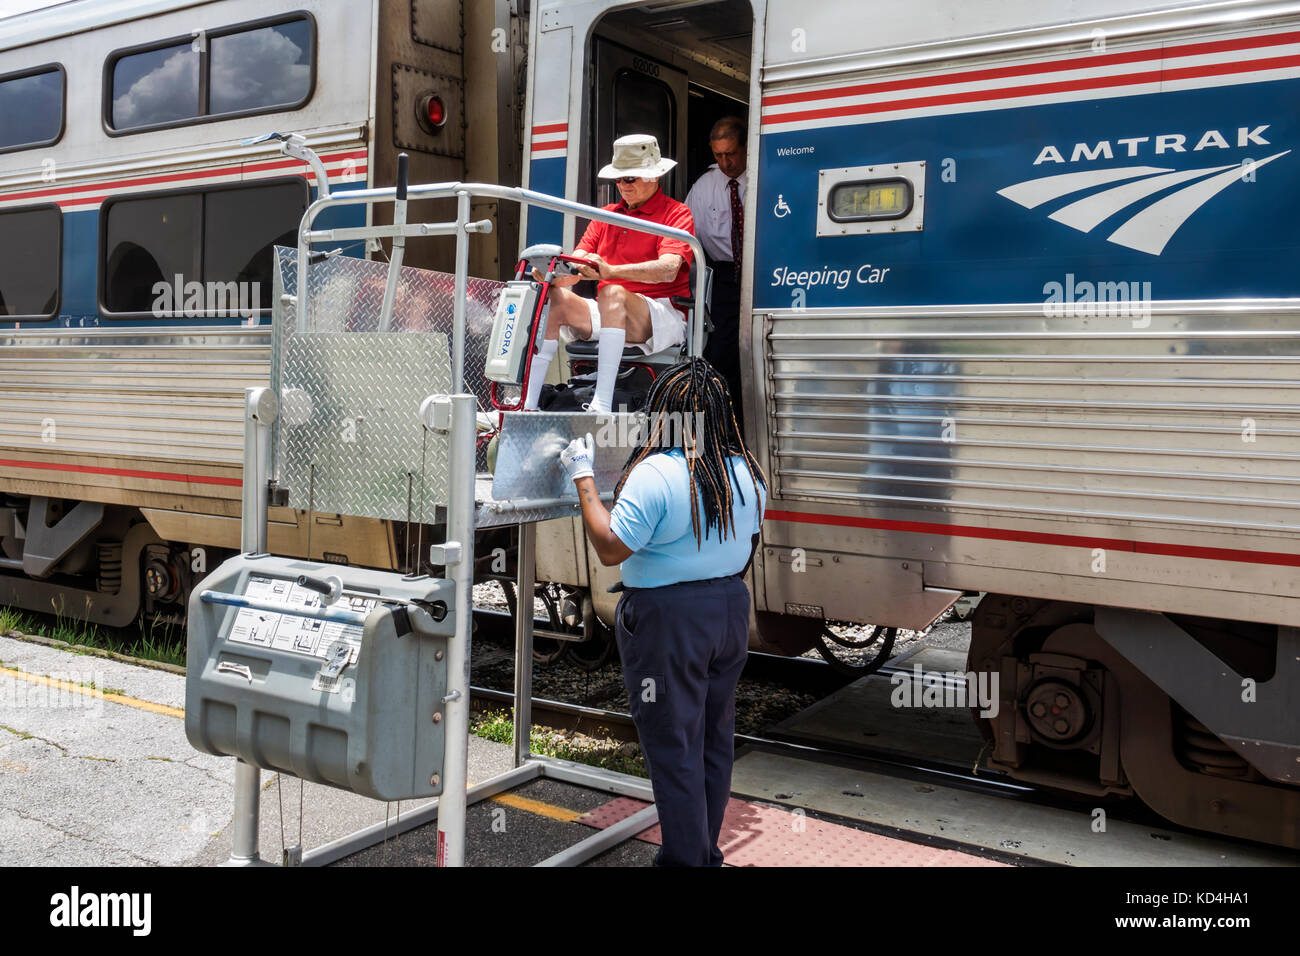 Florida Orlando station railroad train Amtrak stop Black man woman passenger disabled wheelchair lift assisting - Stock Image